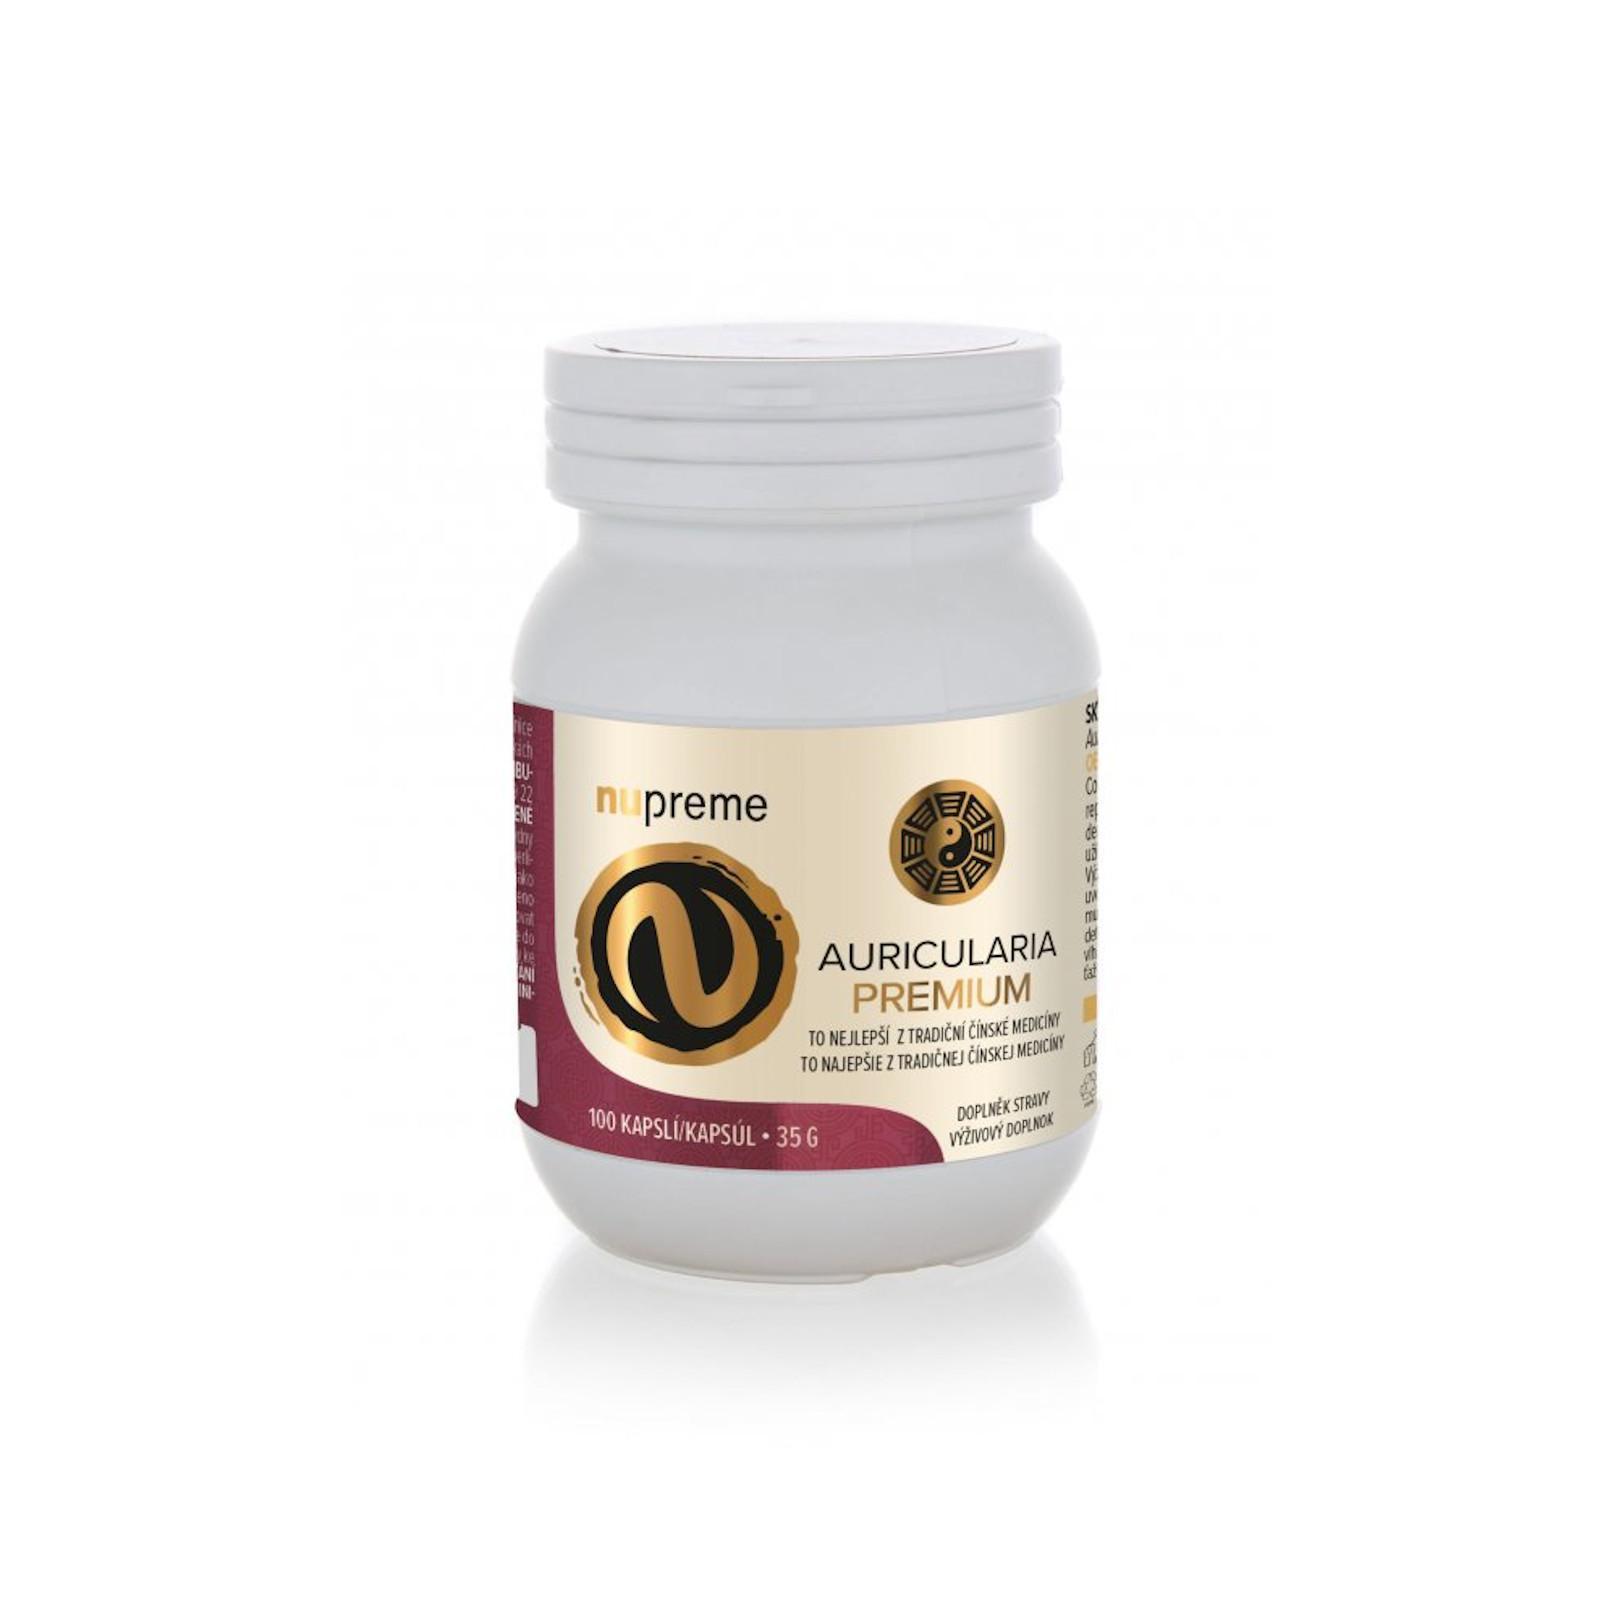 Nupreme Auricularia premium extrakt, kapsle 100 ks, 35 g